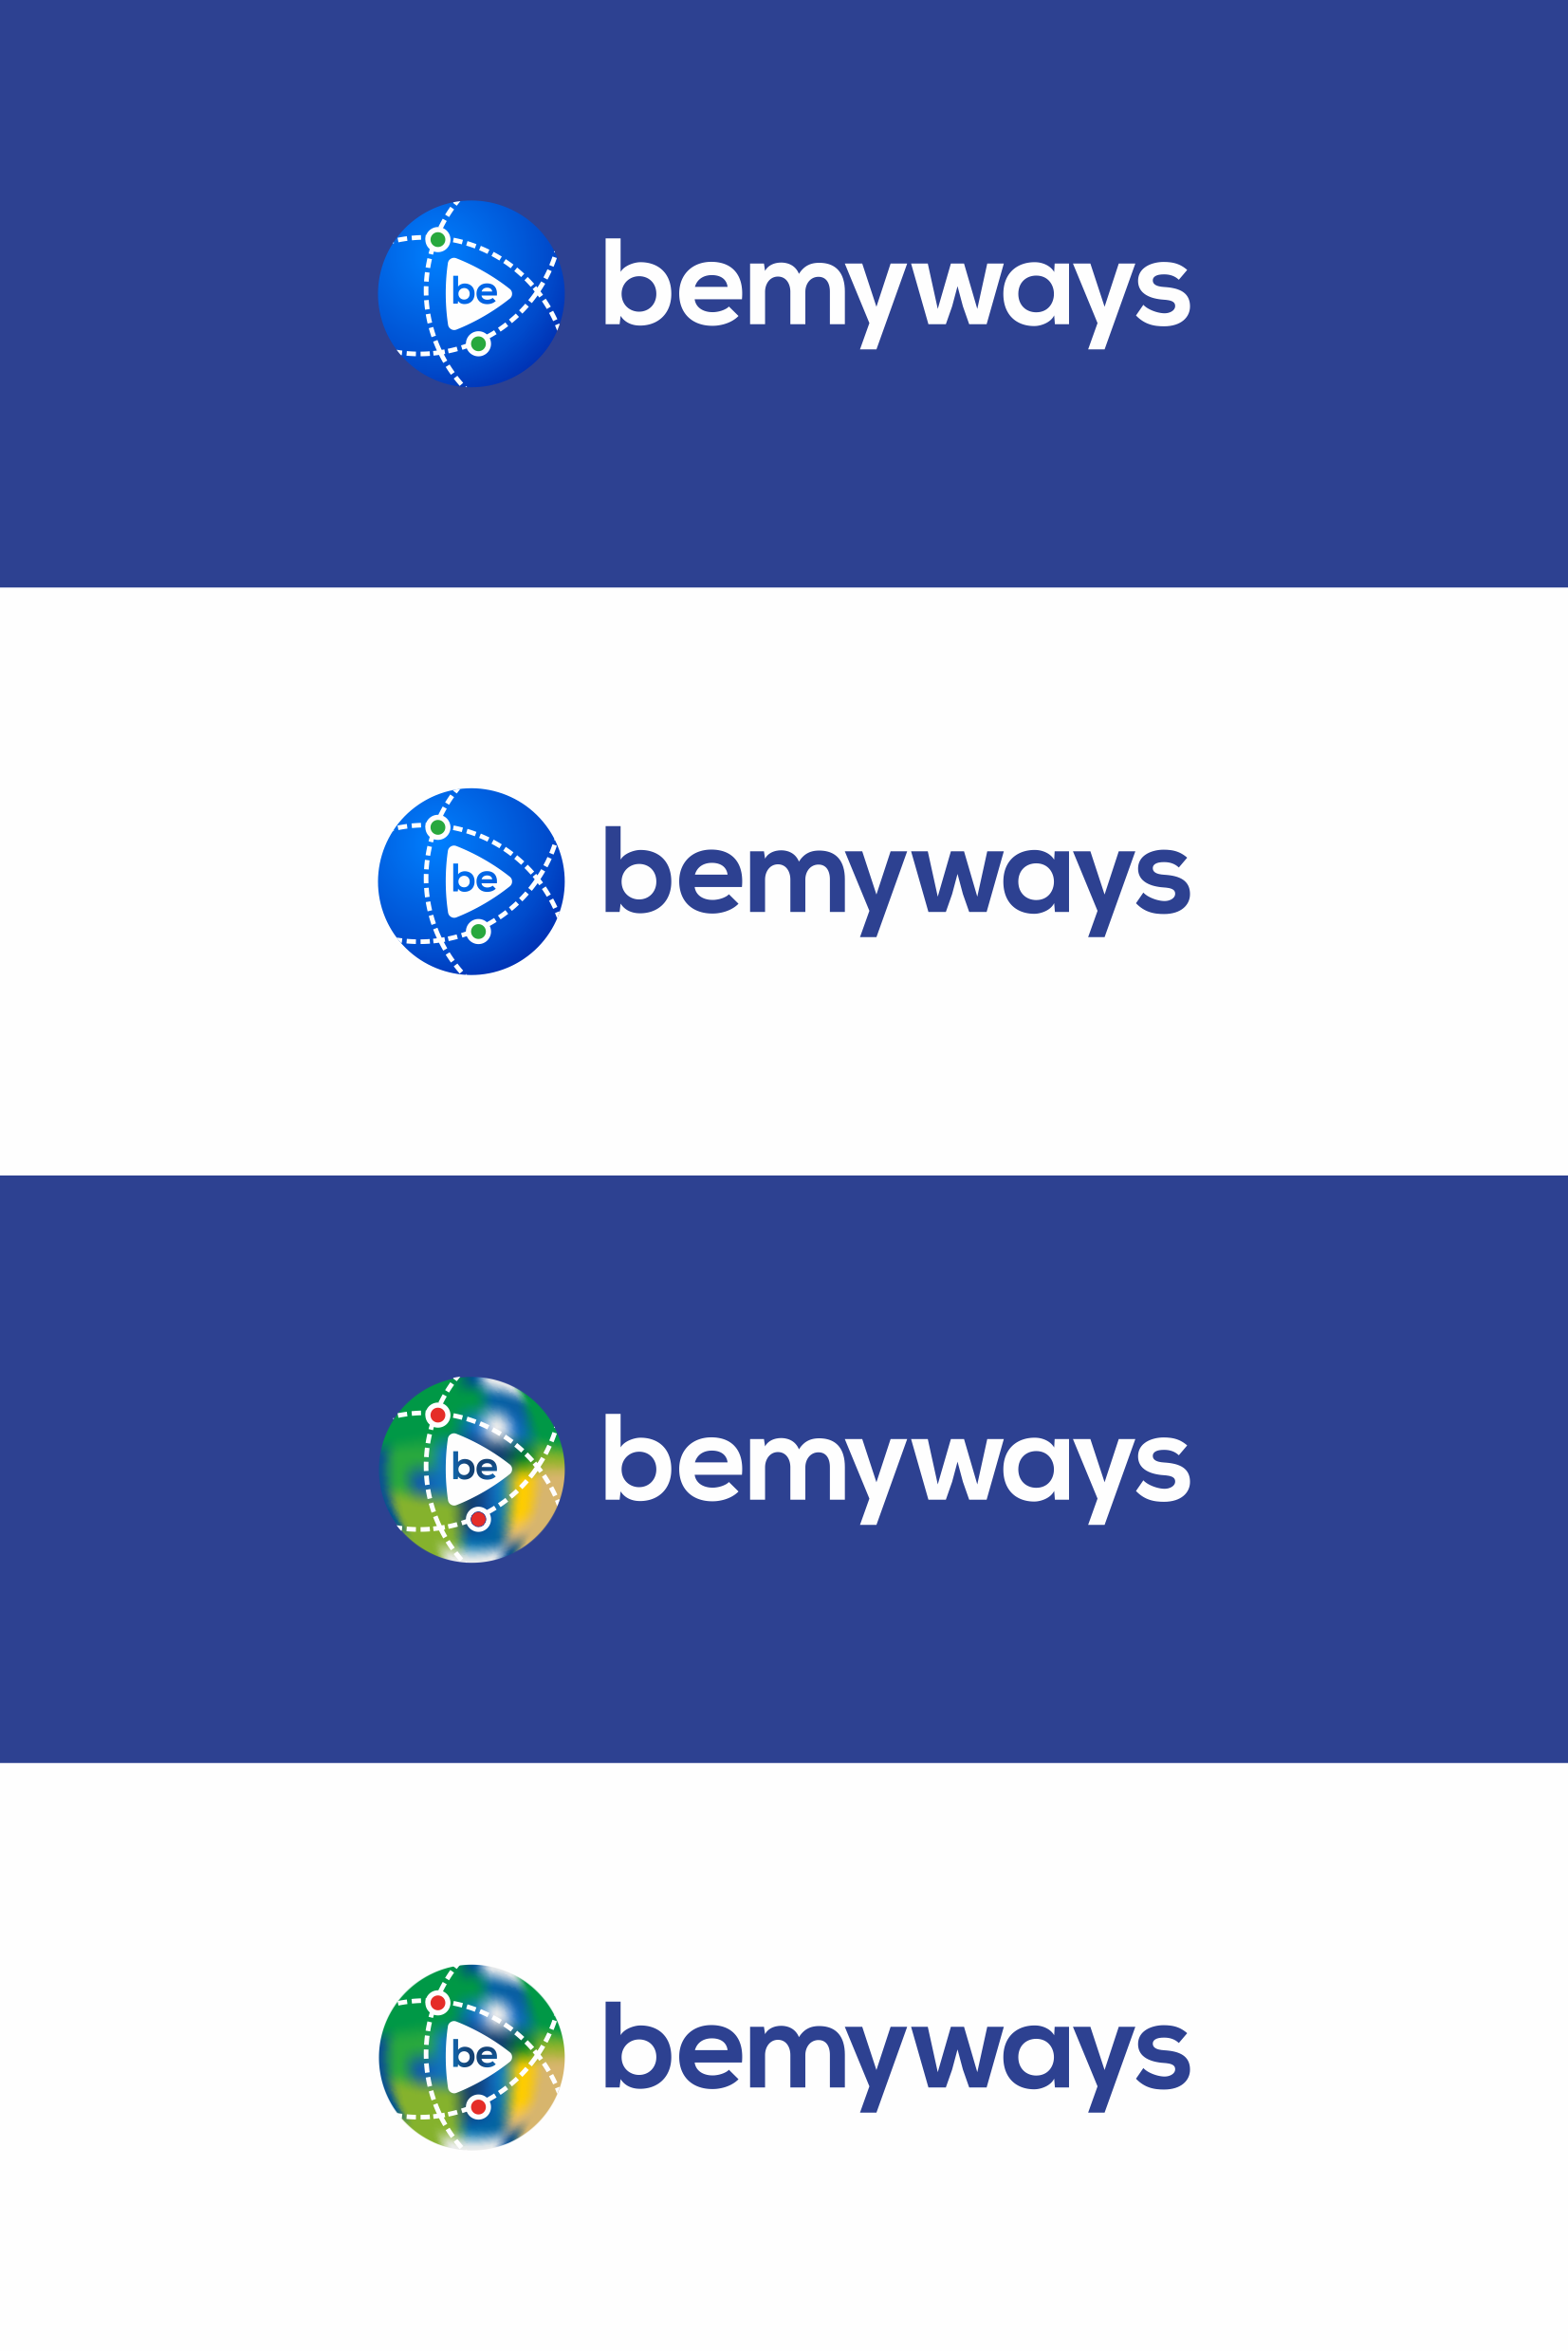 Разработка логотипа и иконки для Travel Video Platform фото f_4895c37111d69d84.png